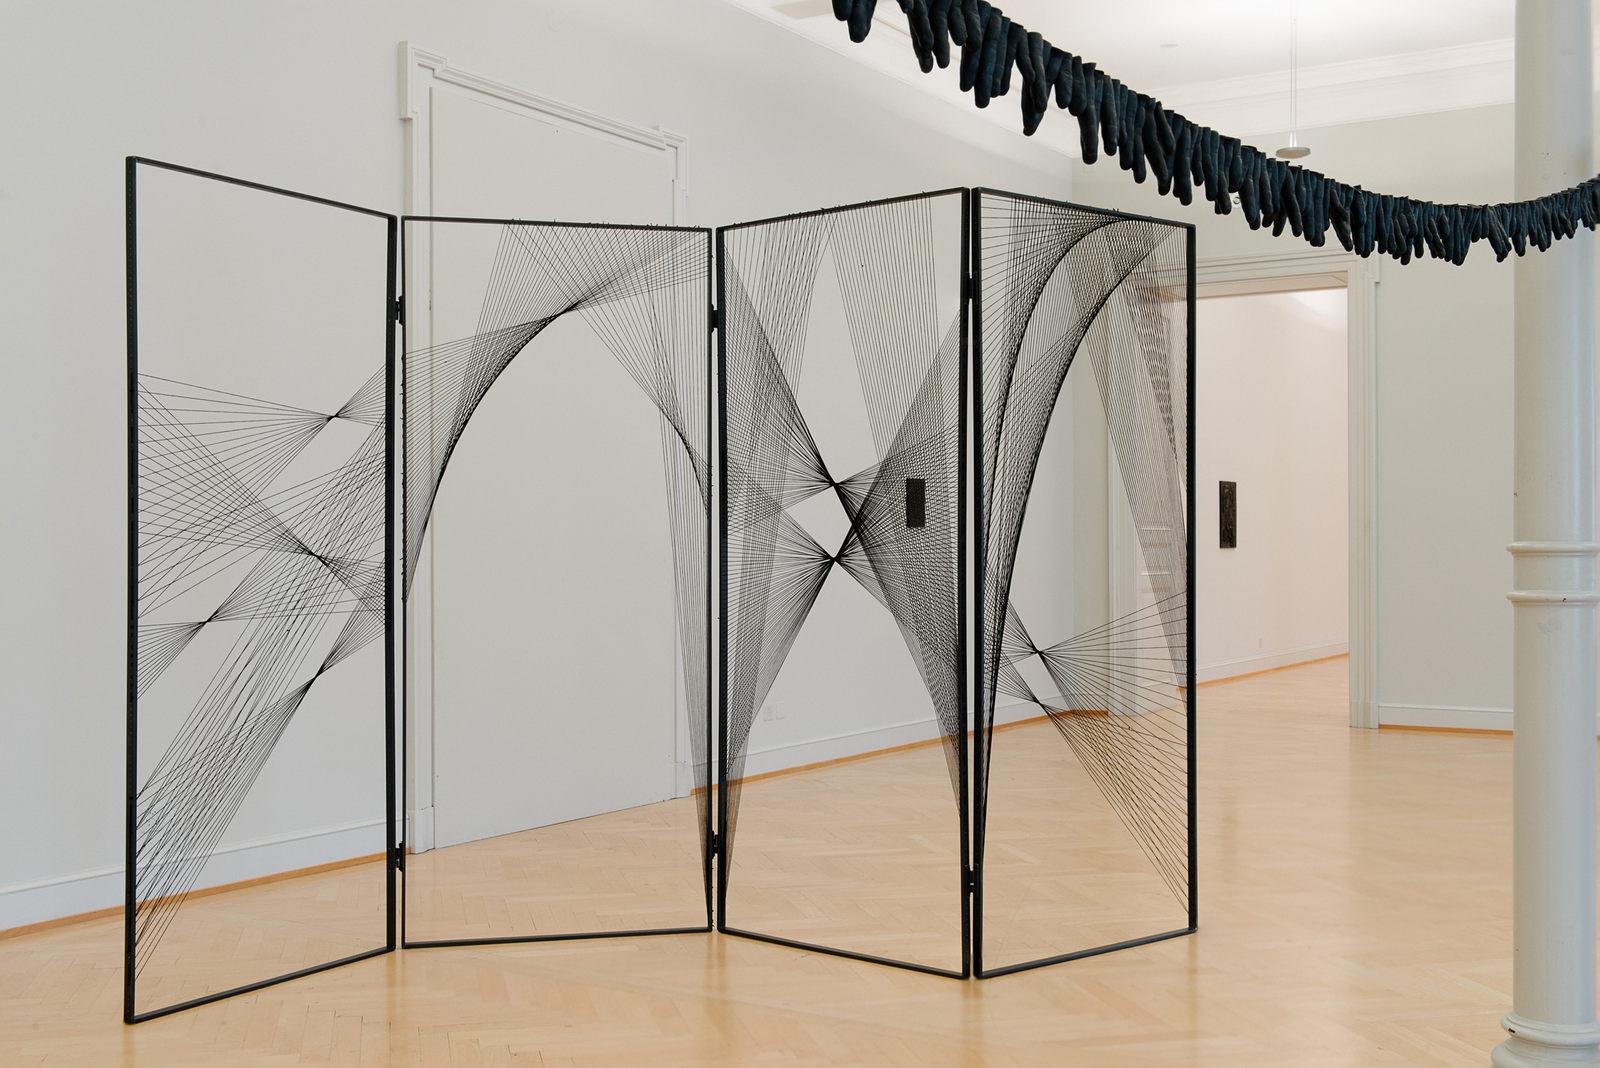 10_Installationsansicht_St.Gallen_Foto_Sebastian_Stadler